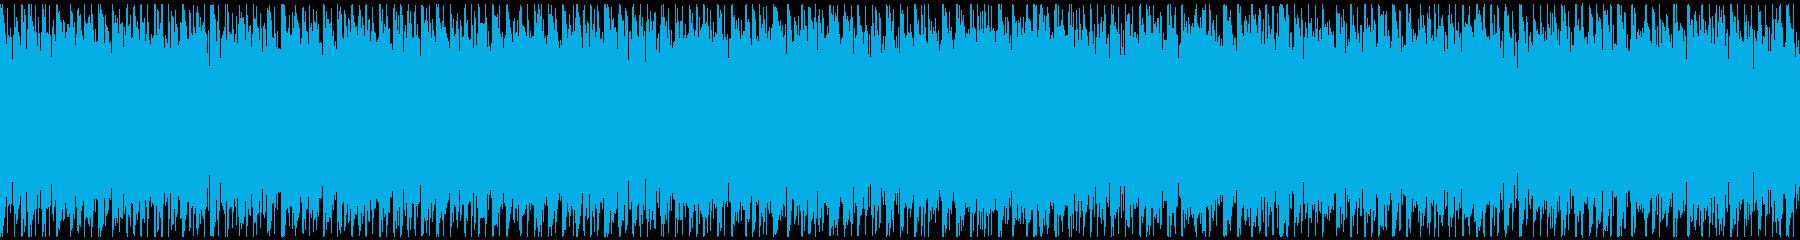 Modeの再生済みの波形